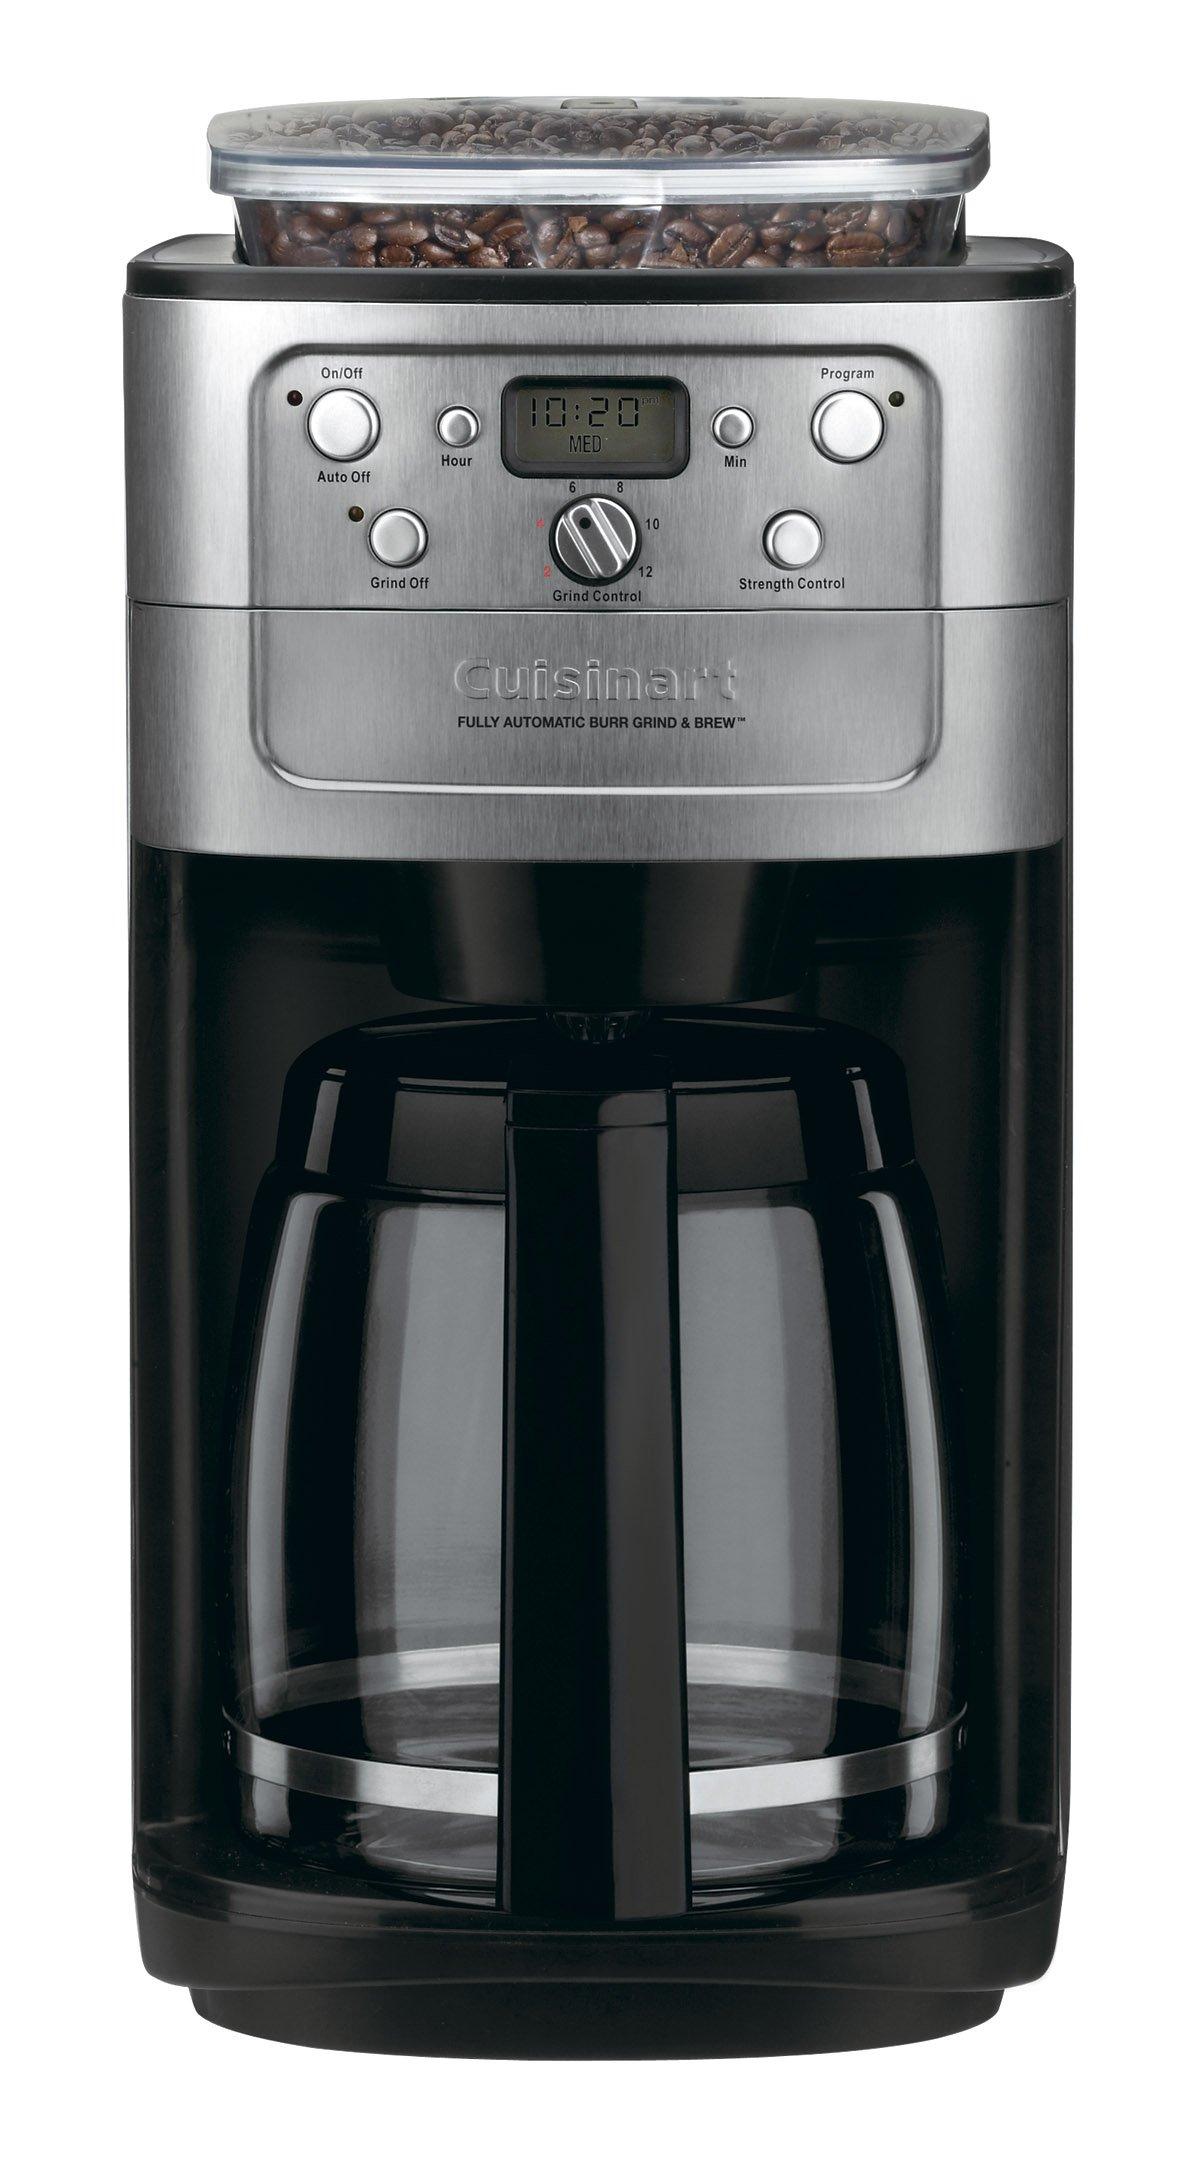 Cuisinart DGB 700BC Grind Coffeemaker Chrome